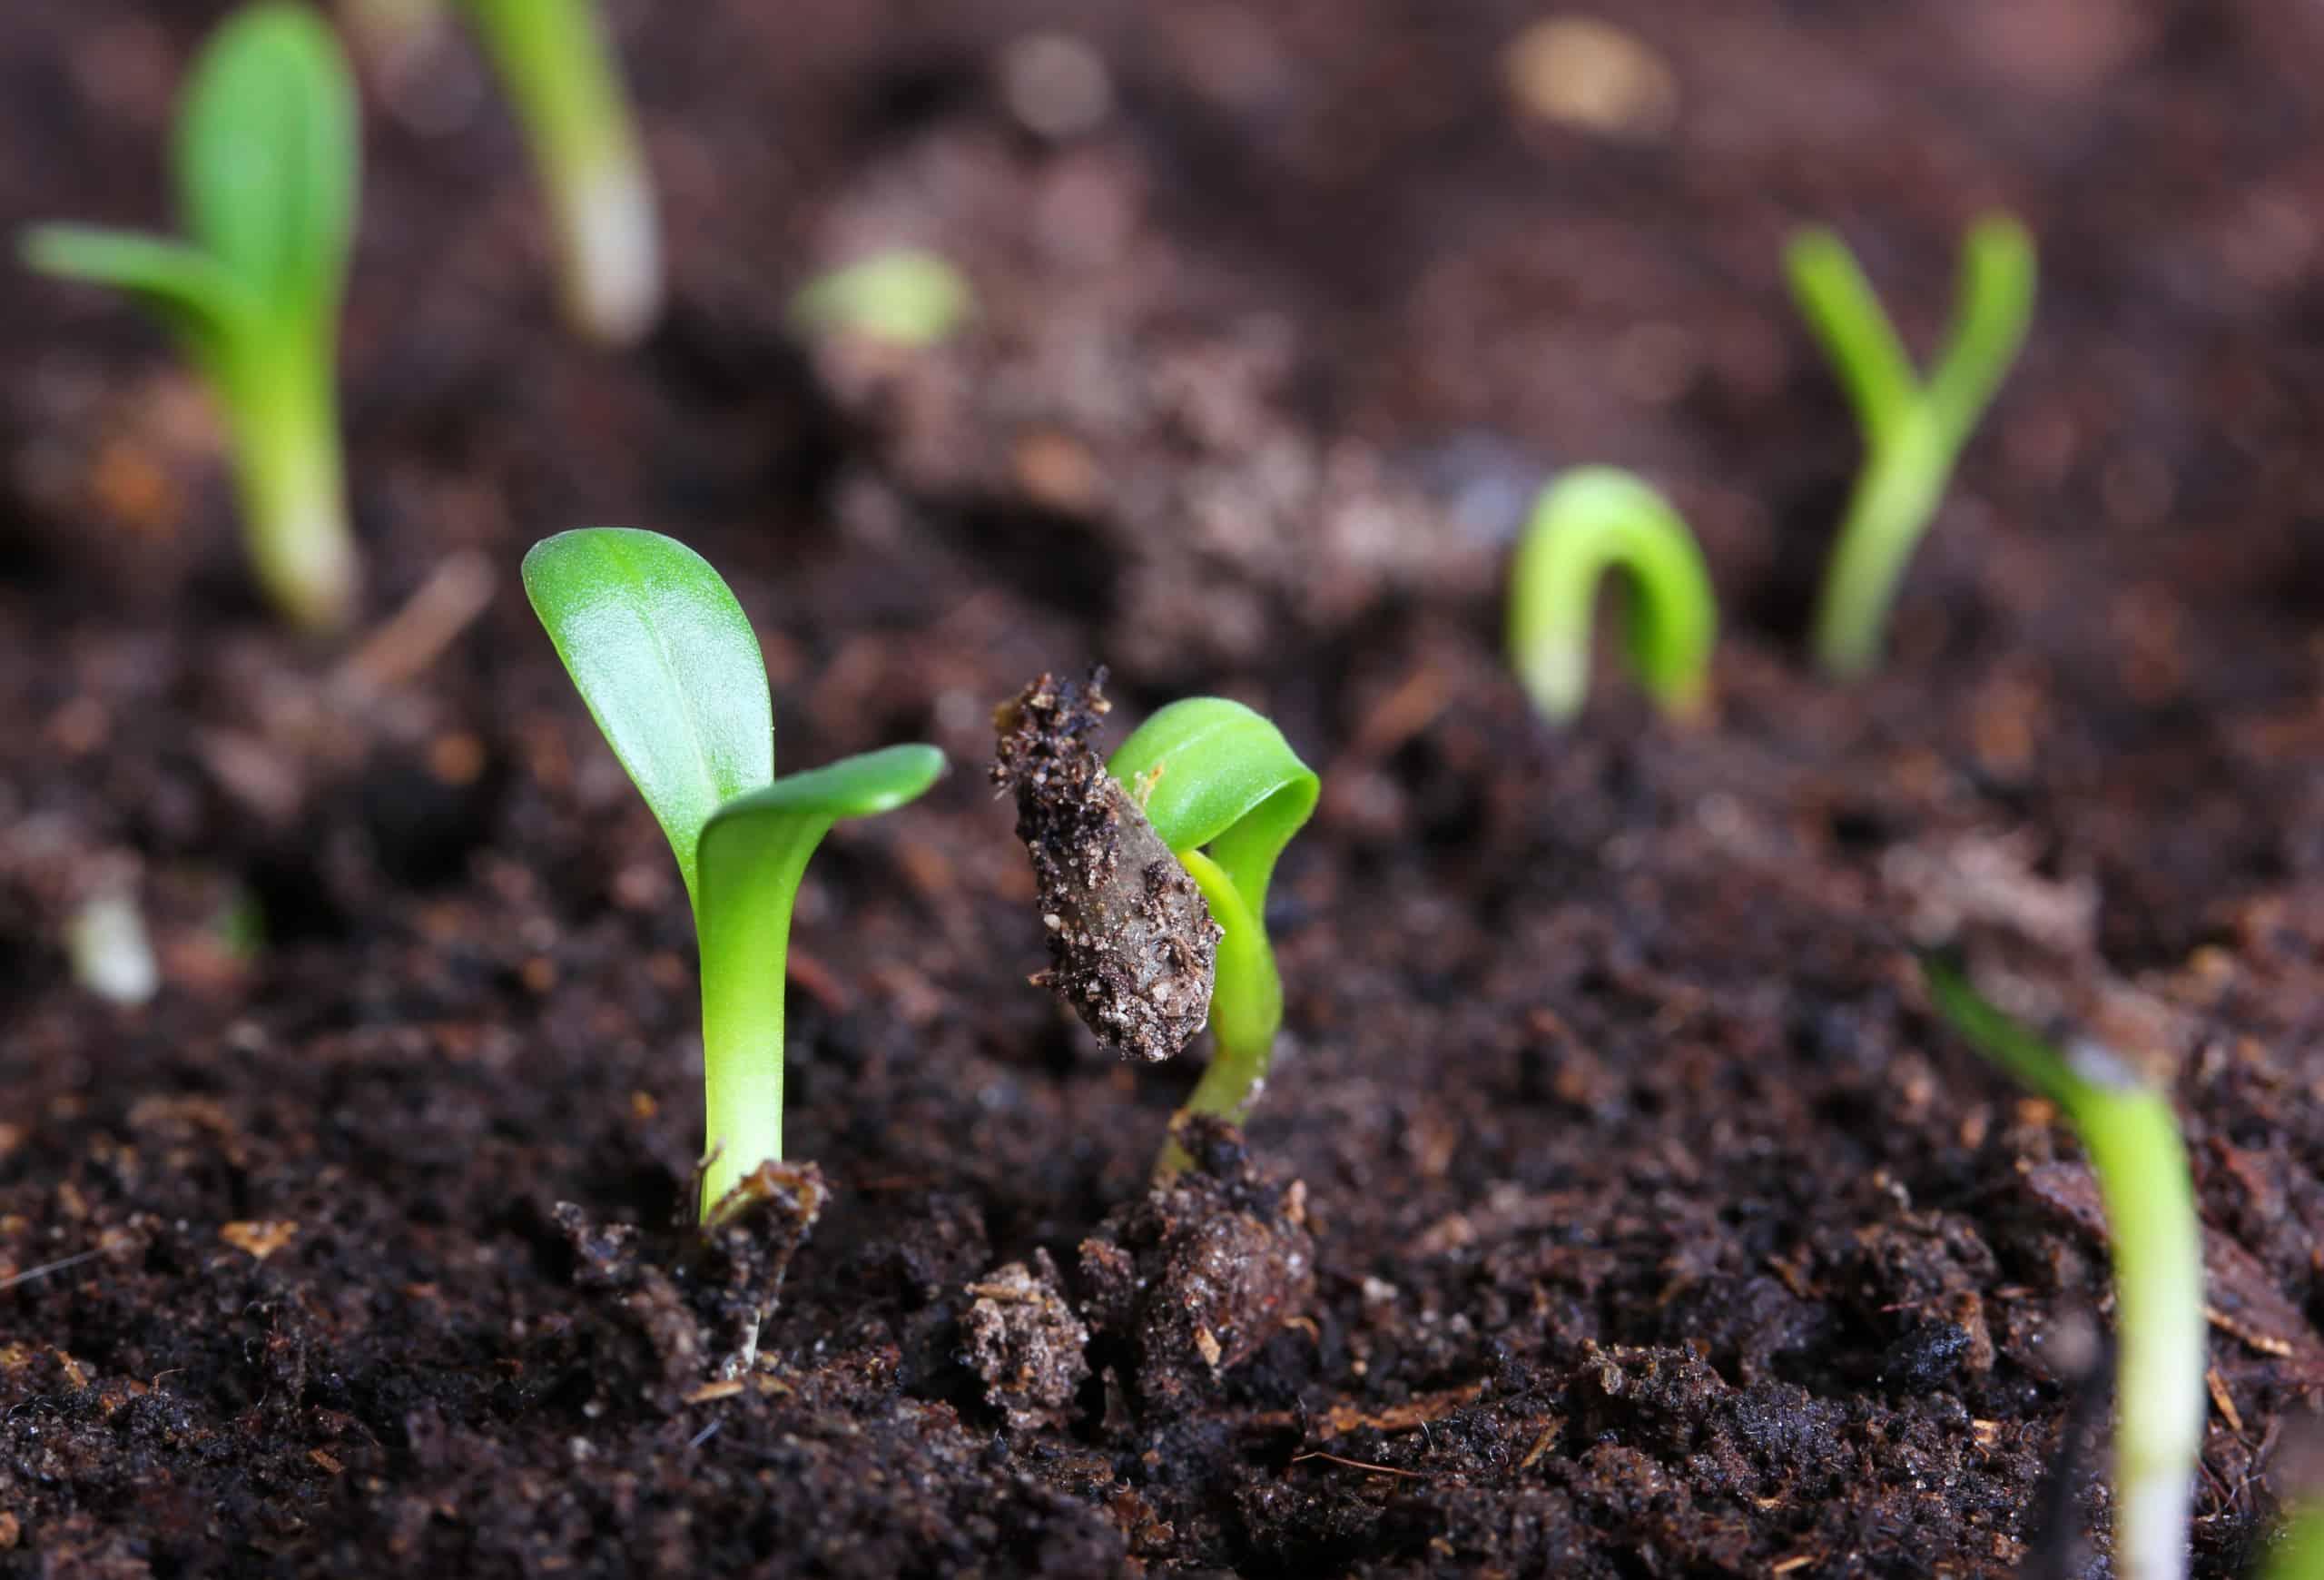 Organic farming helps build better soil